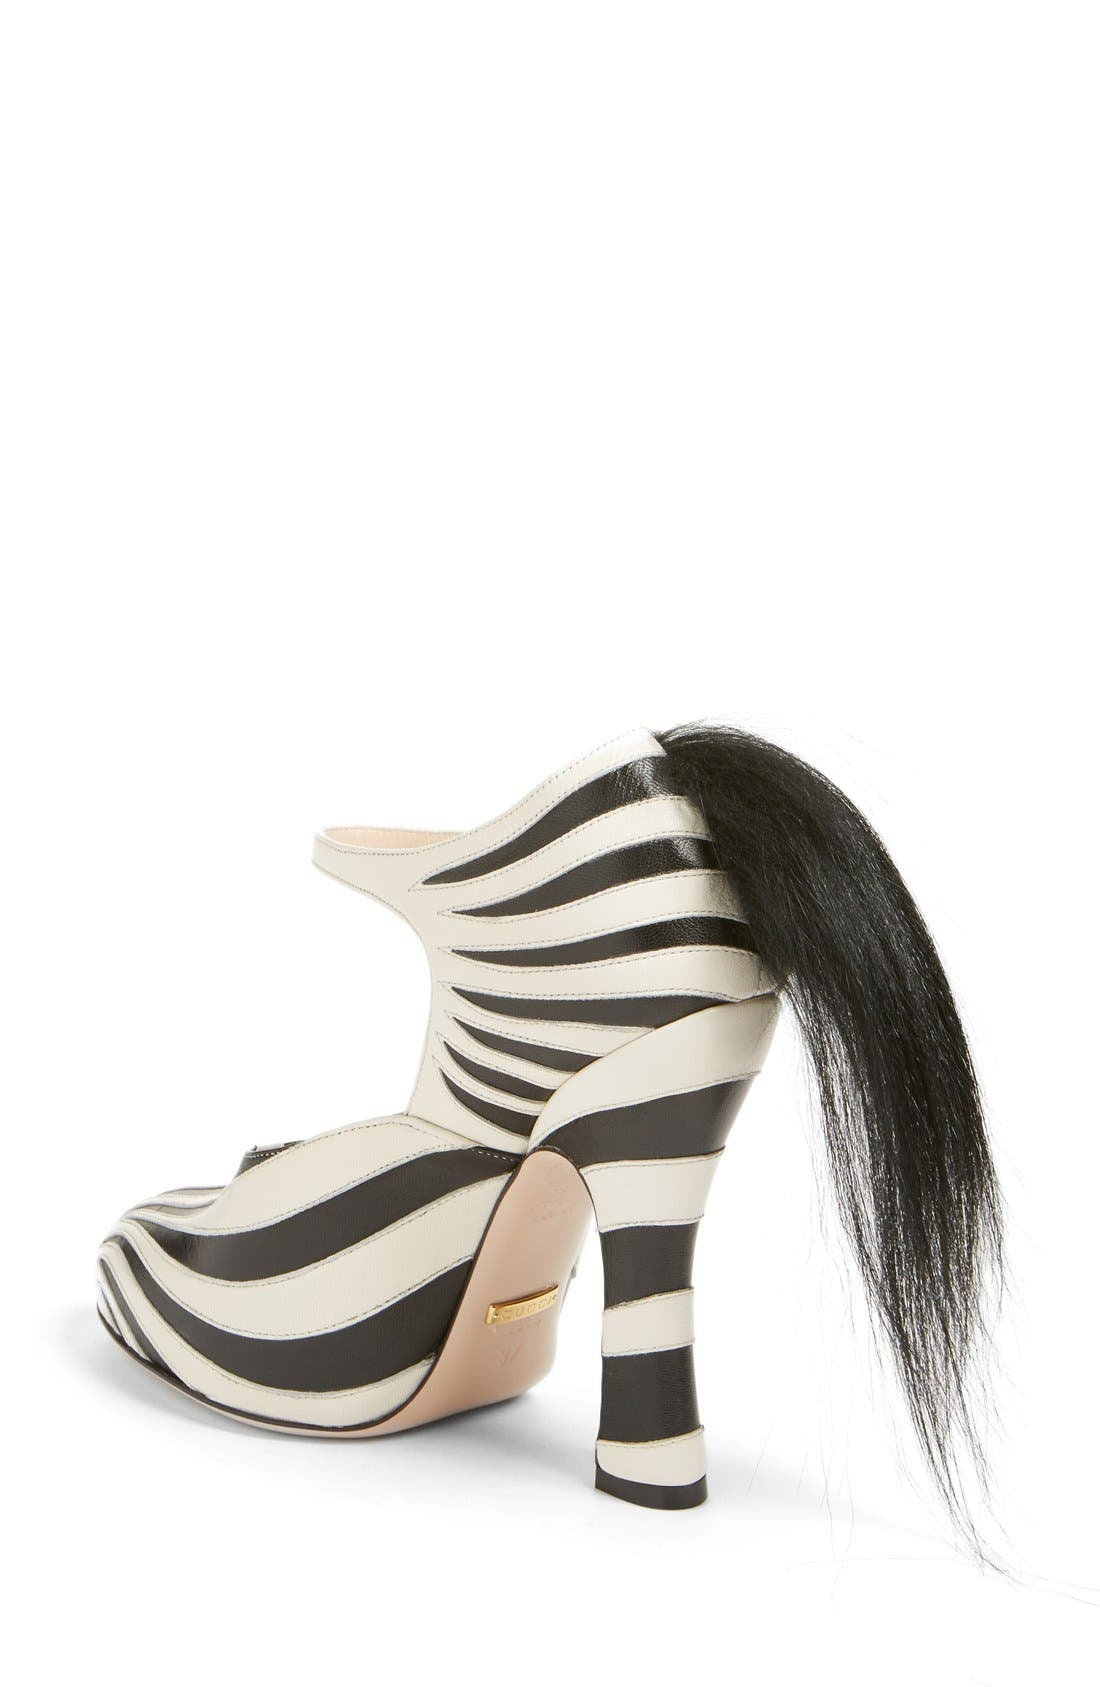 'Lesley' Zebra Stripe Pump,                             Alternate thumbnail 2, color,                             124